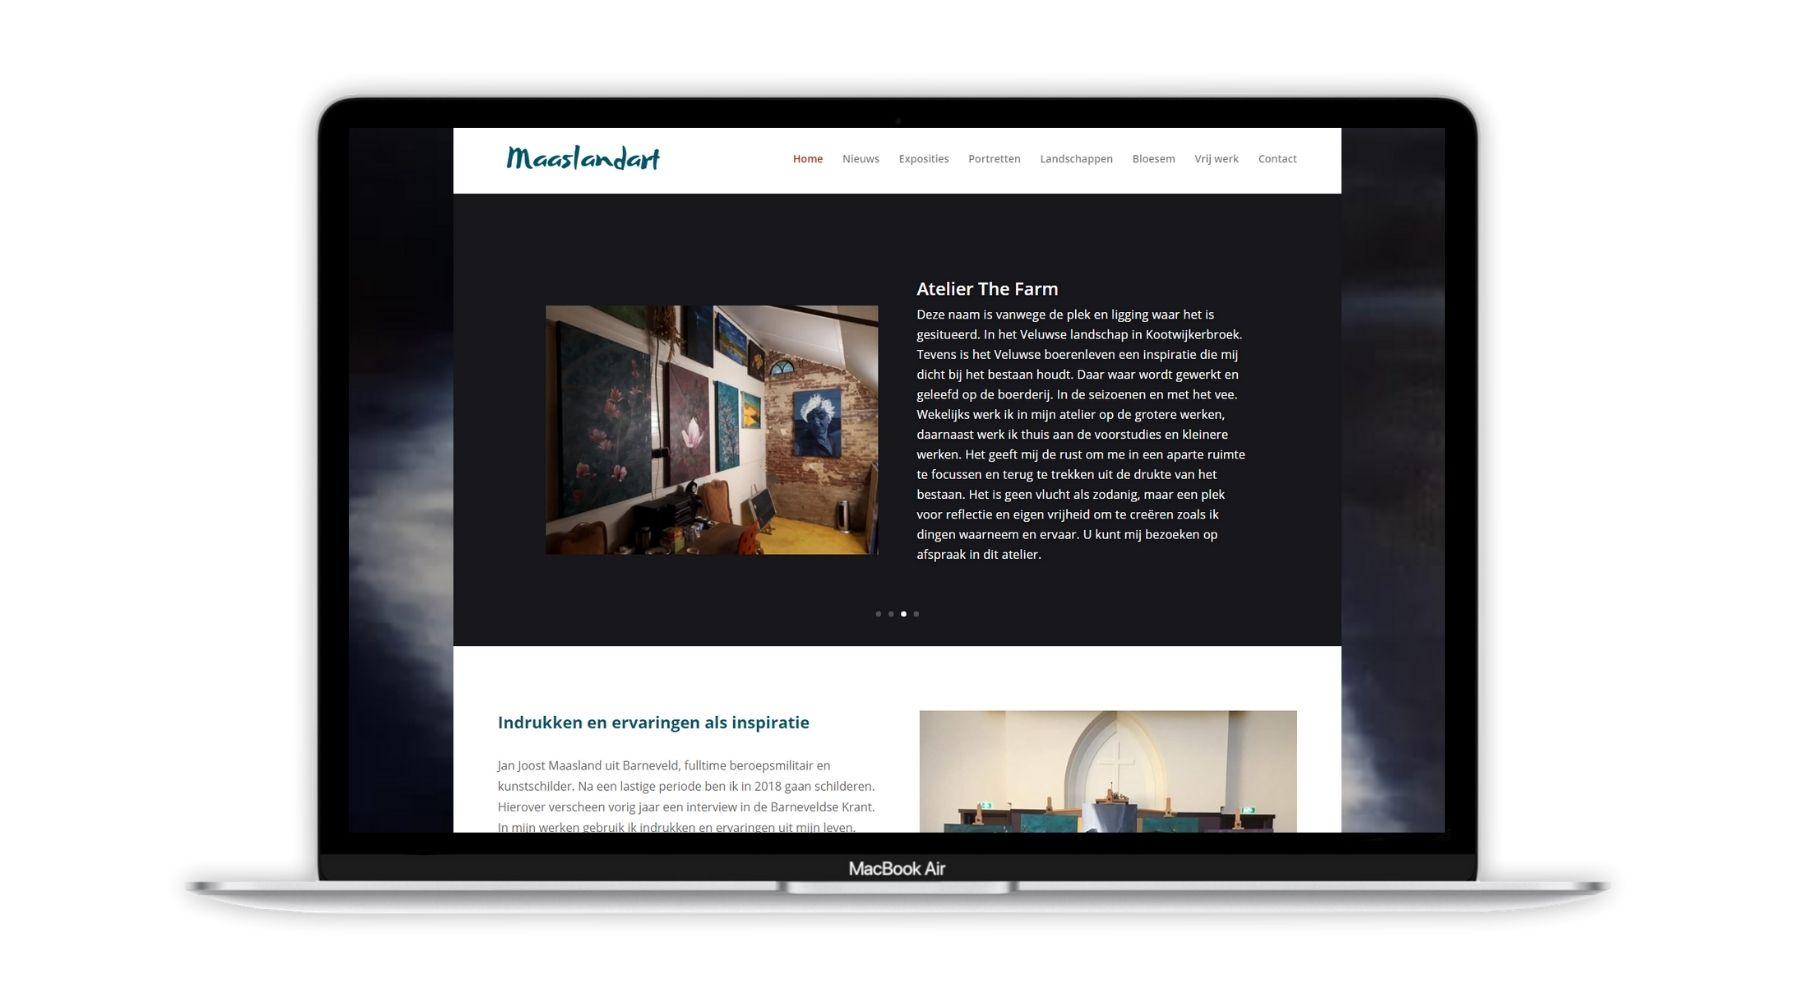 Portfolio project Maaslandart Paula Terpstra Webdesign 1800x1000